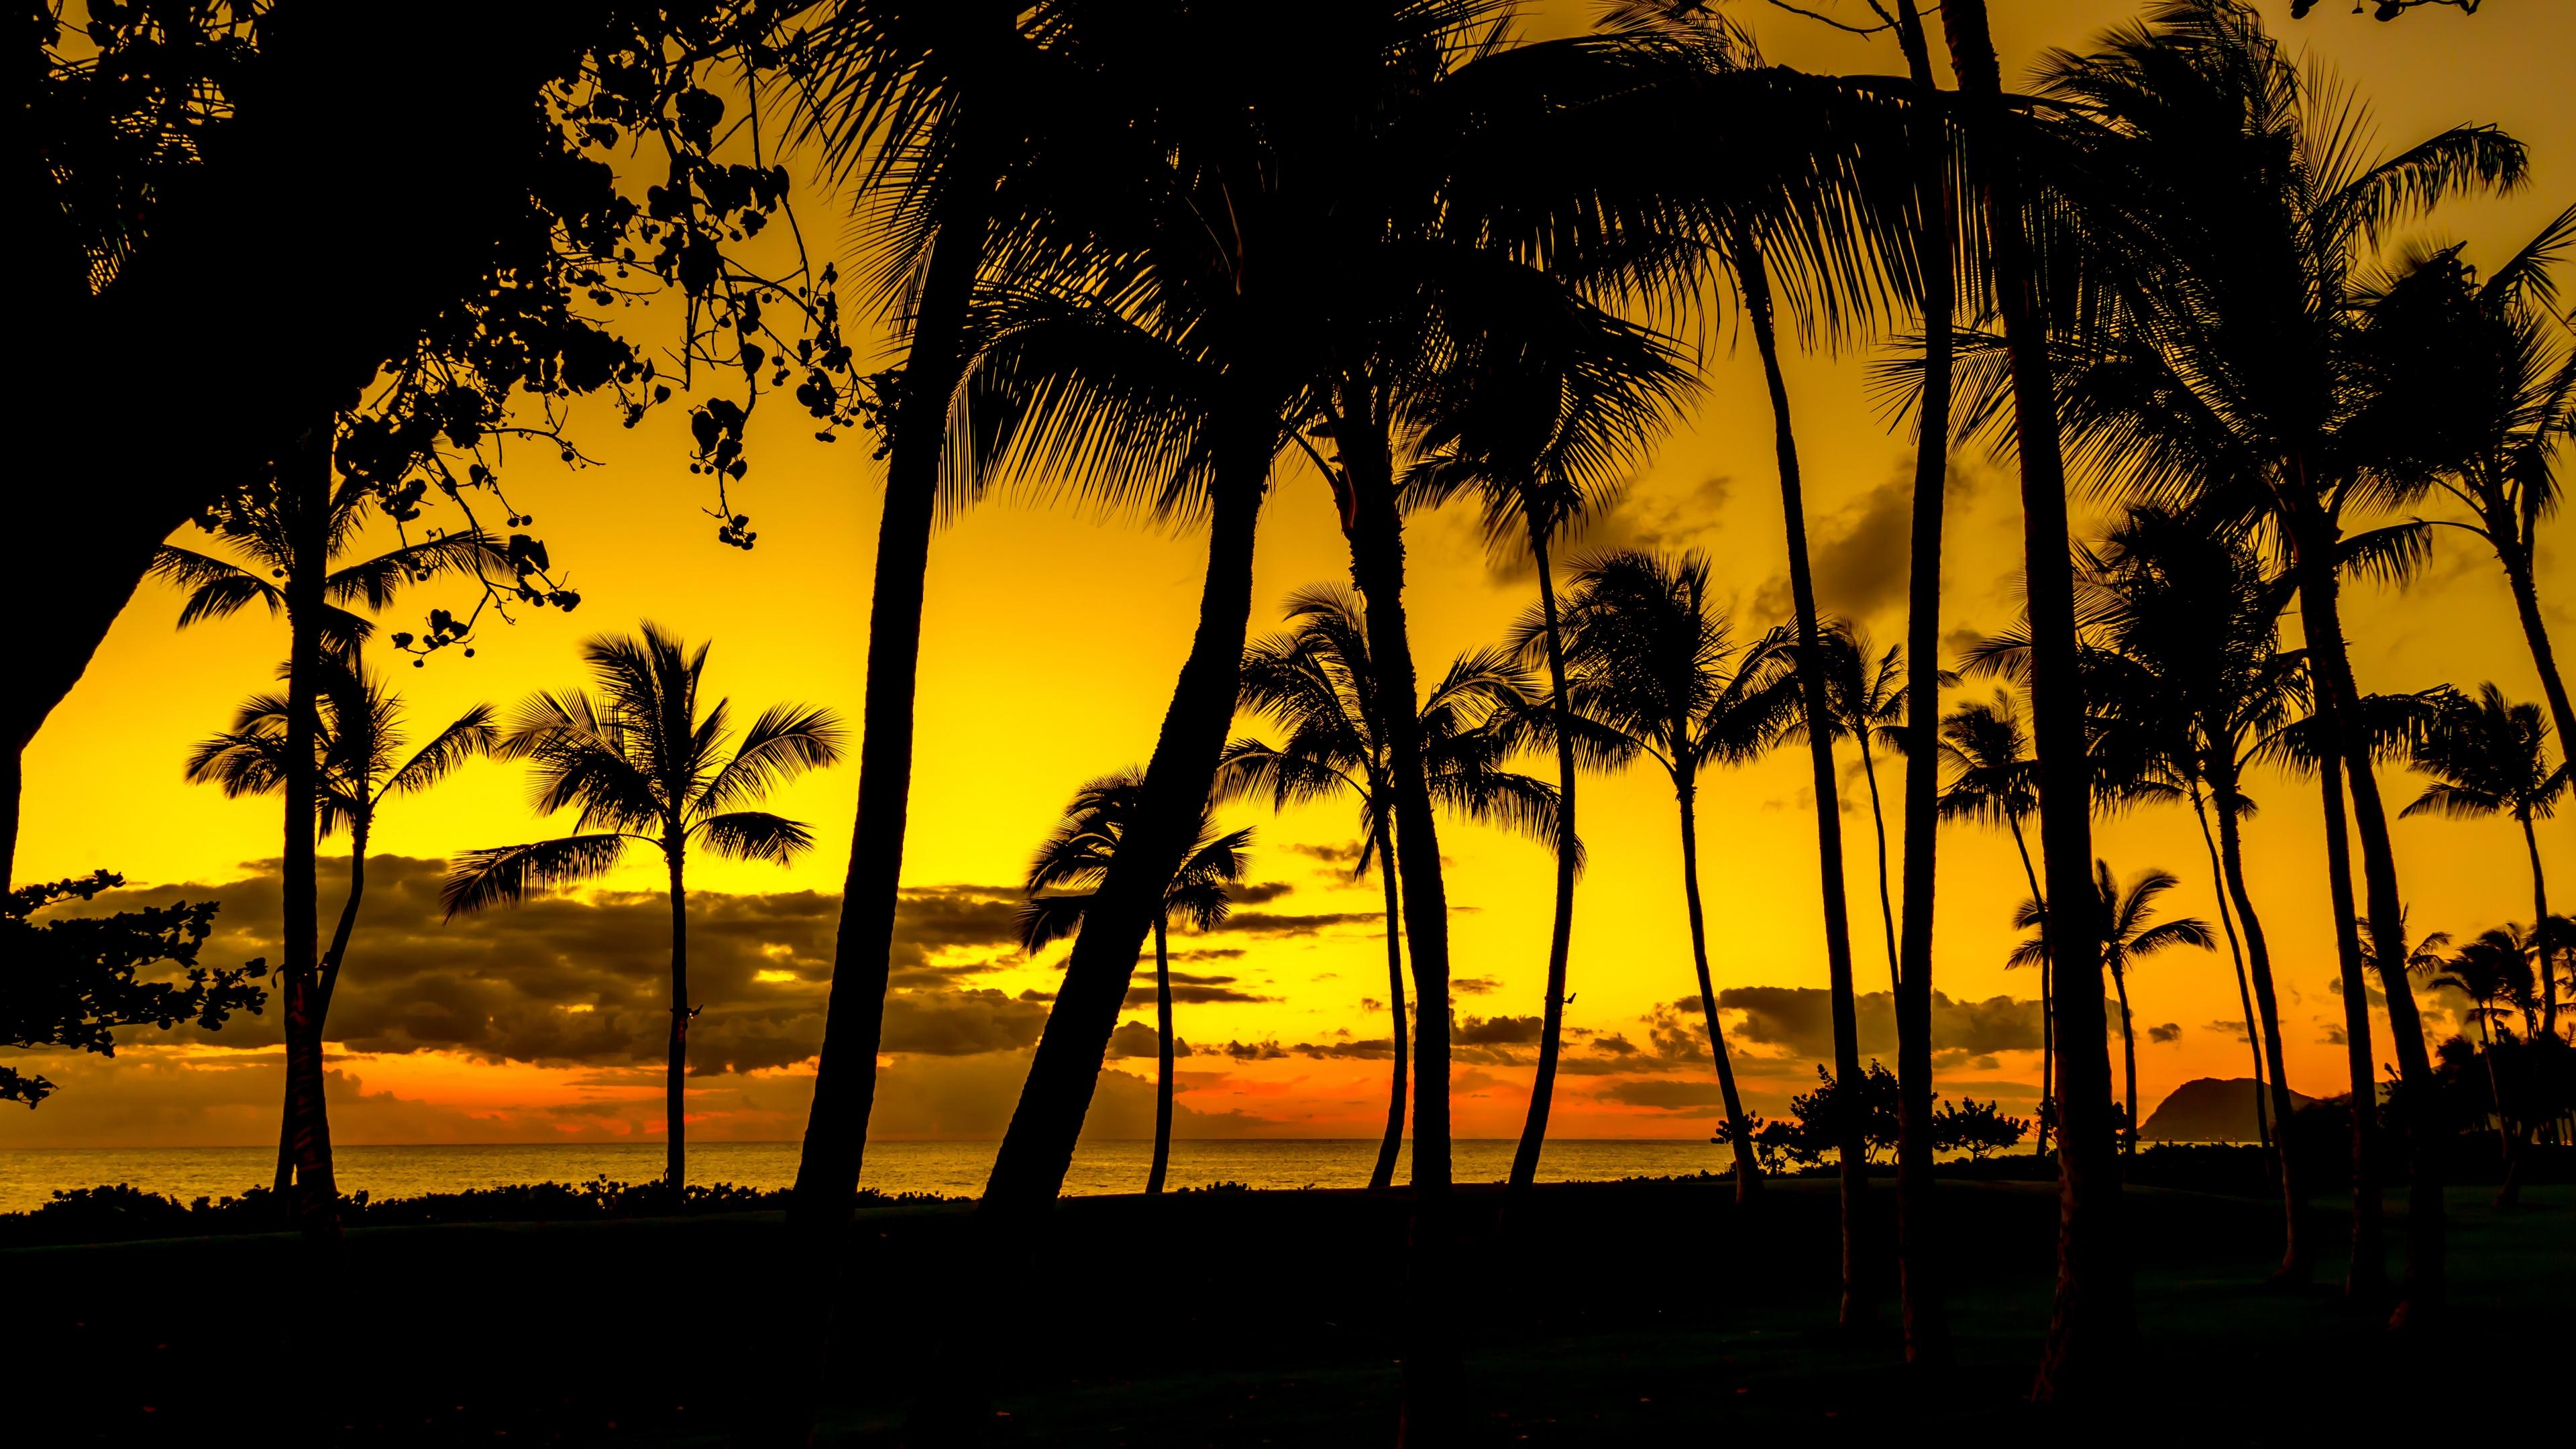 palms sunset tropics shore dark 4k 1541113697 - palms, sunset, tropics, shore, dark 4k - tropics, sunset, palms